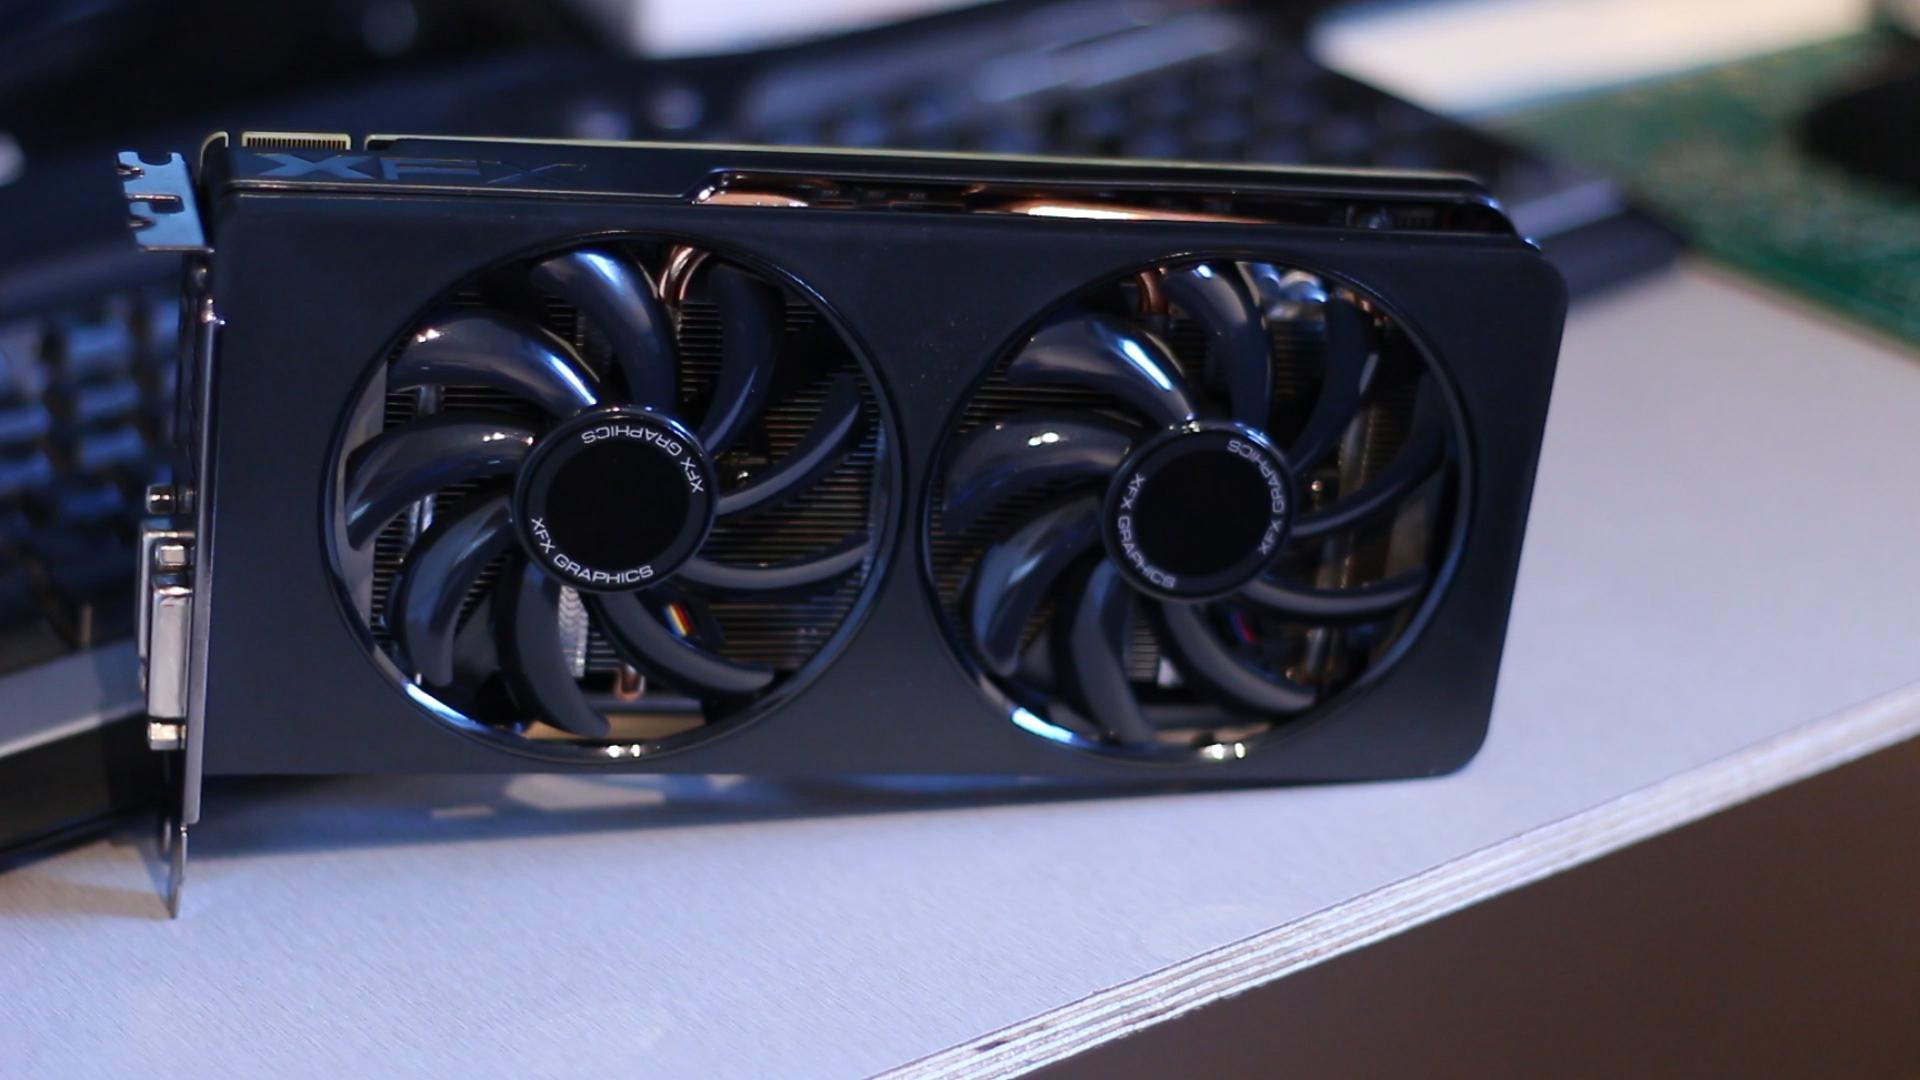 XFX R9 270X 4GB DD Review | TechteamGB